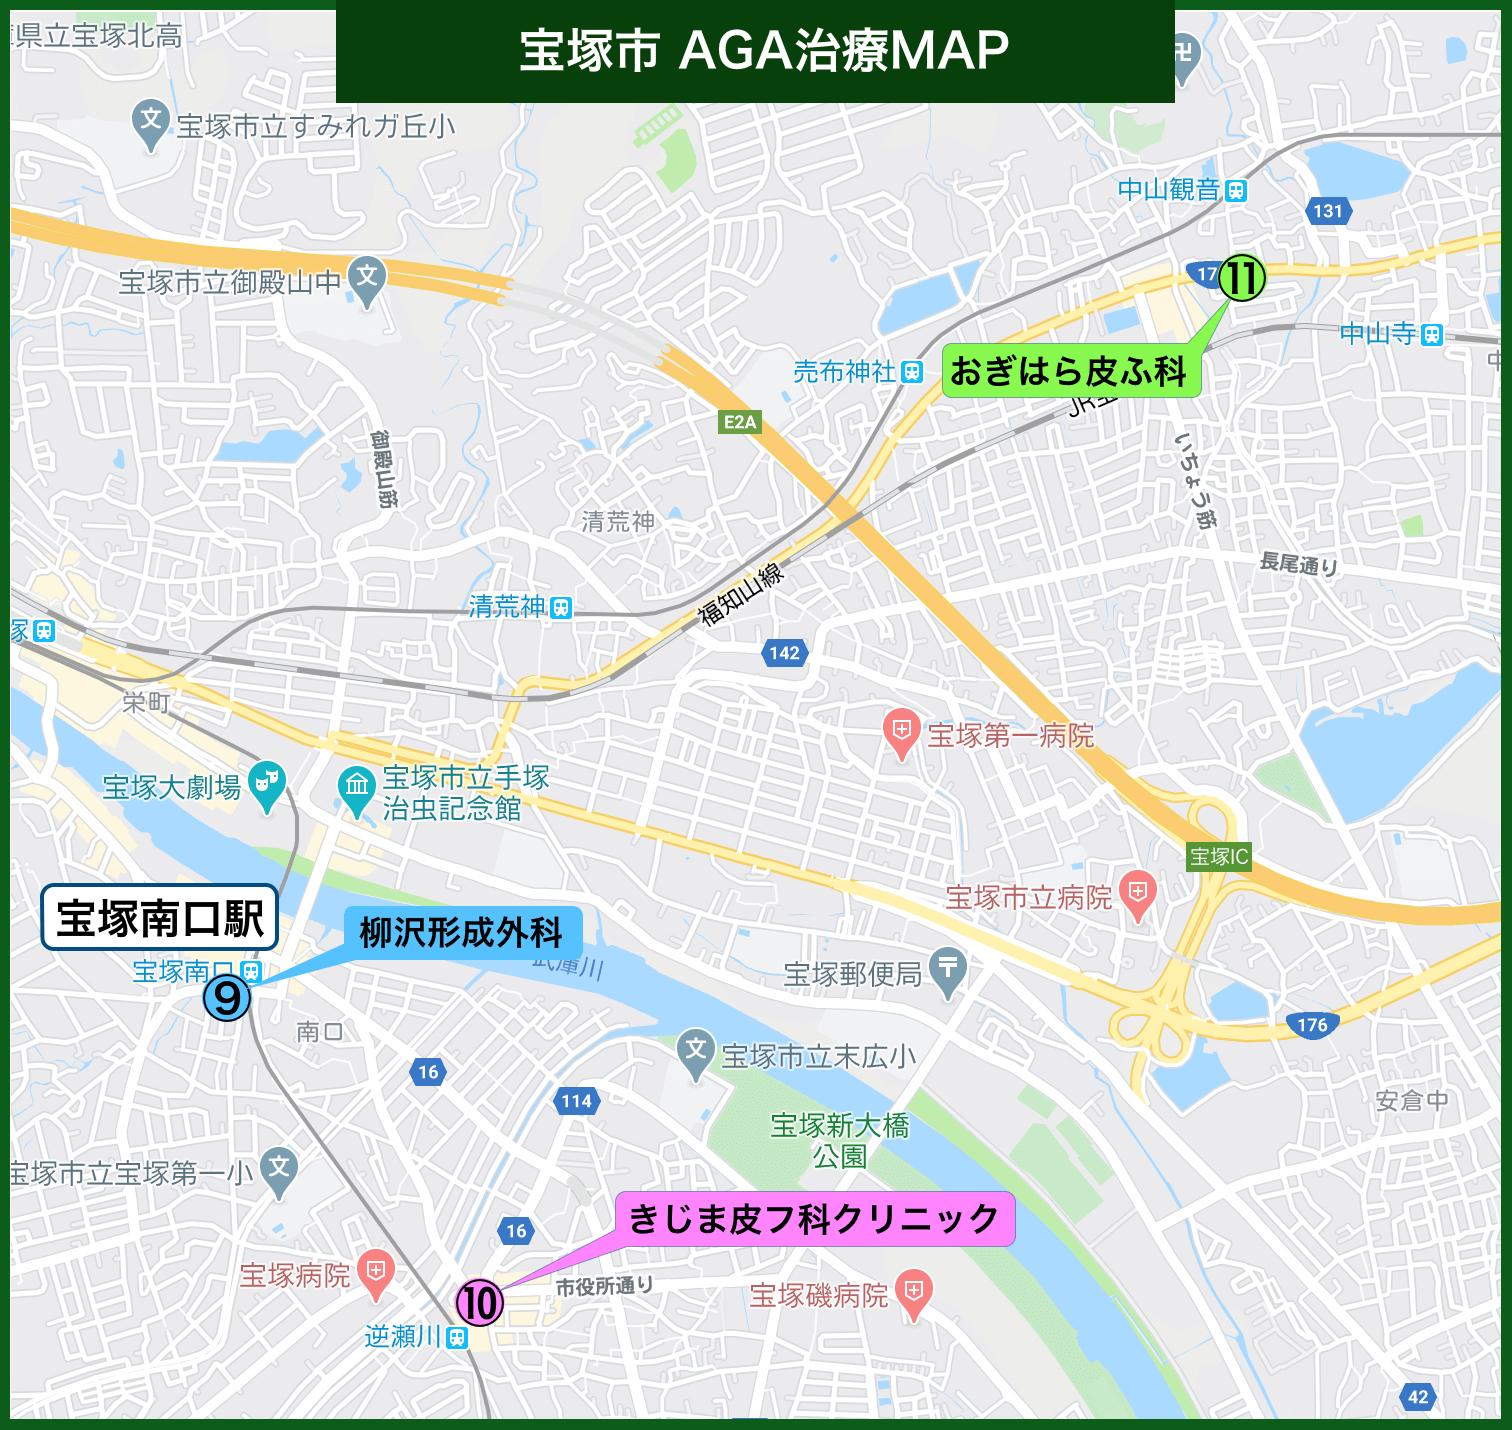 宝塚市 AGA治療MAP